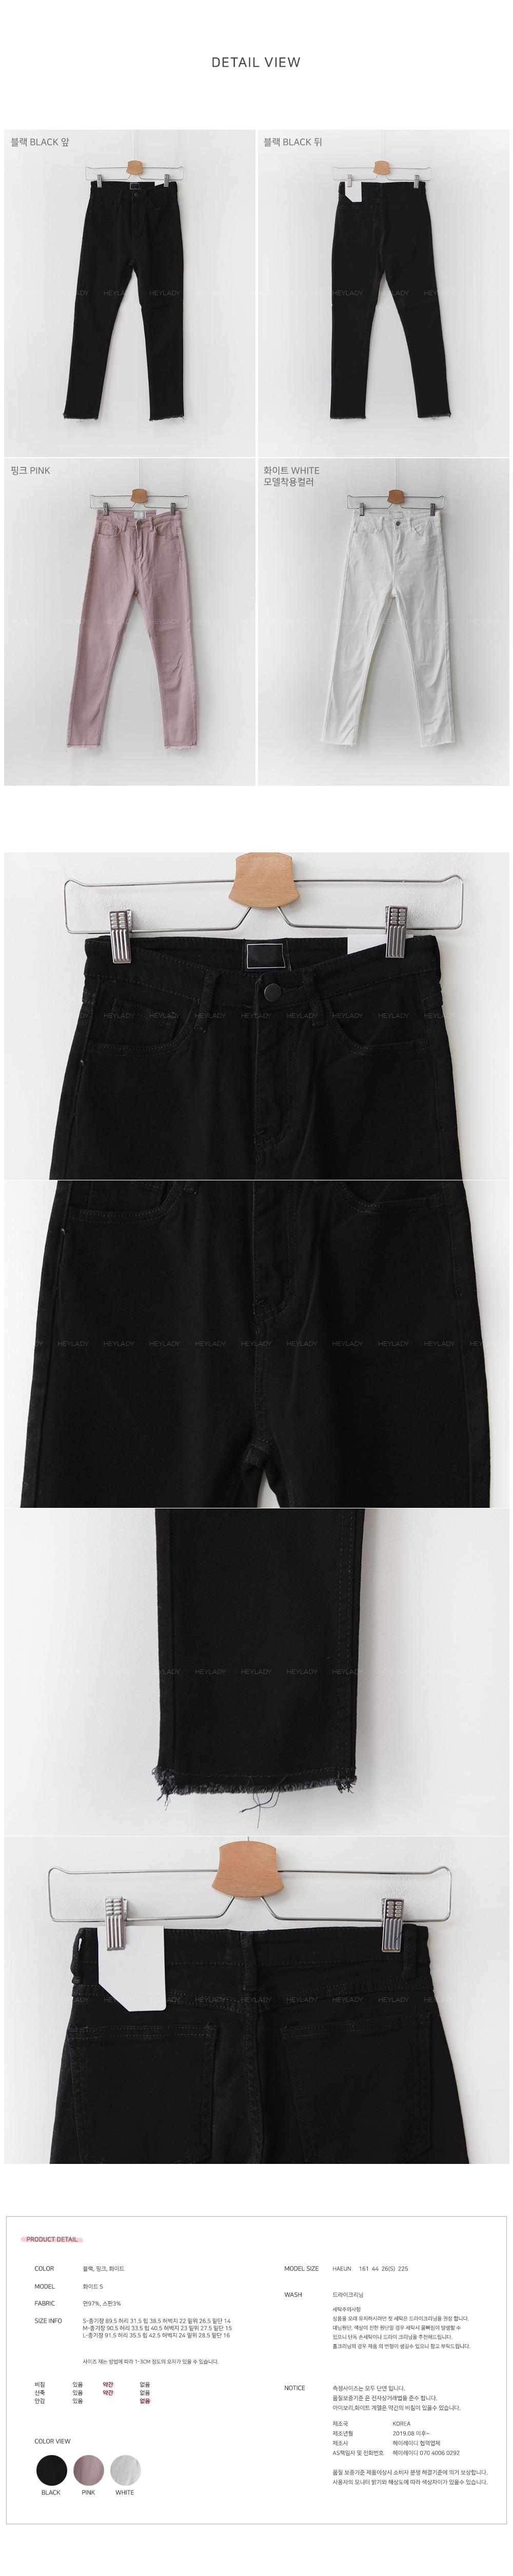 Spree Date Cotton Pants